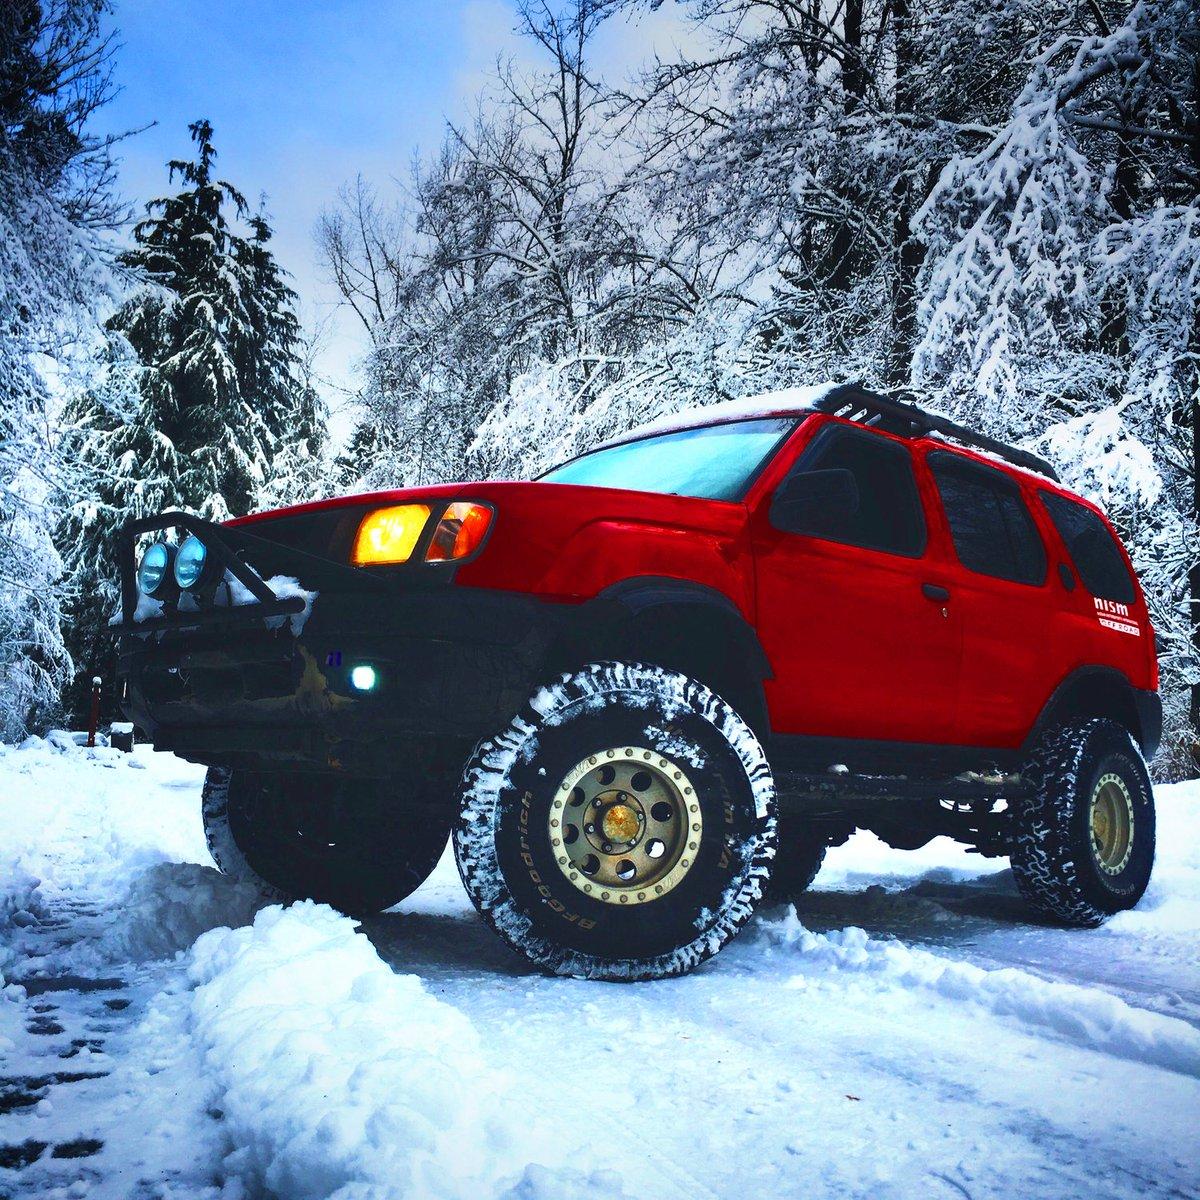 Snow monster. #Nissan #Xterra - Photo: Trey Z. https://t.co/FIIZoVehe0